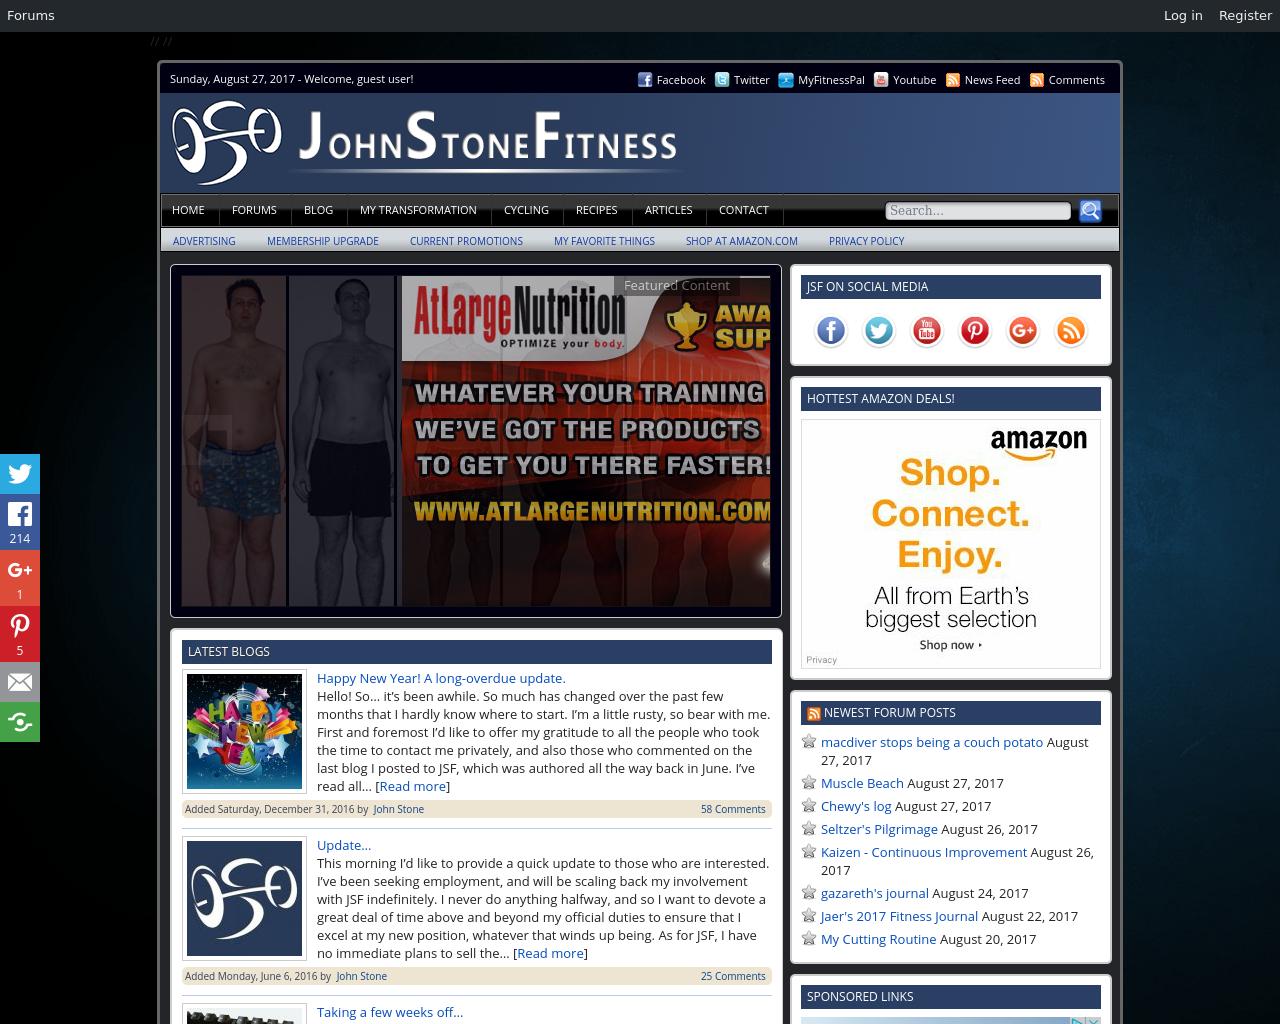 John-Stone-Fitness.com-Advertising-Reviews-Pricing